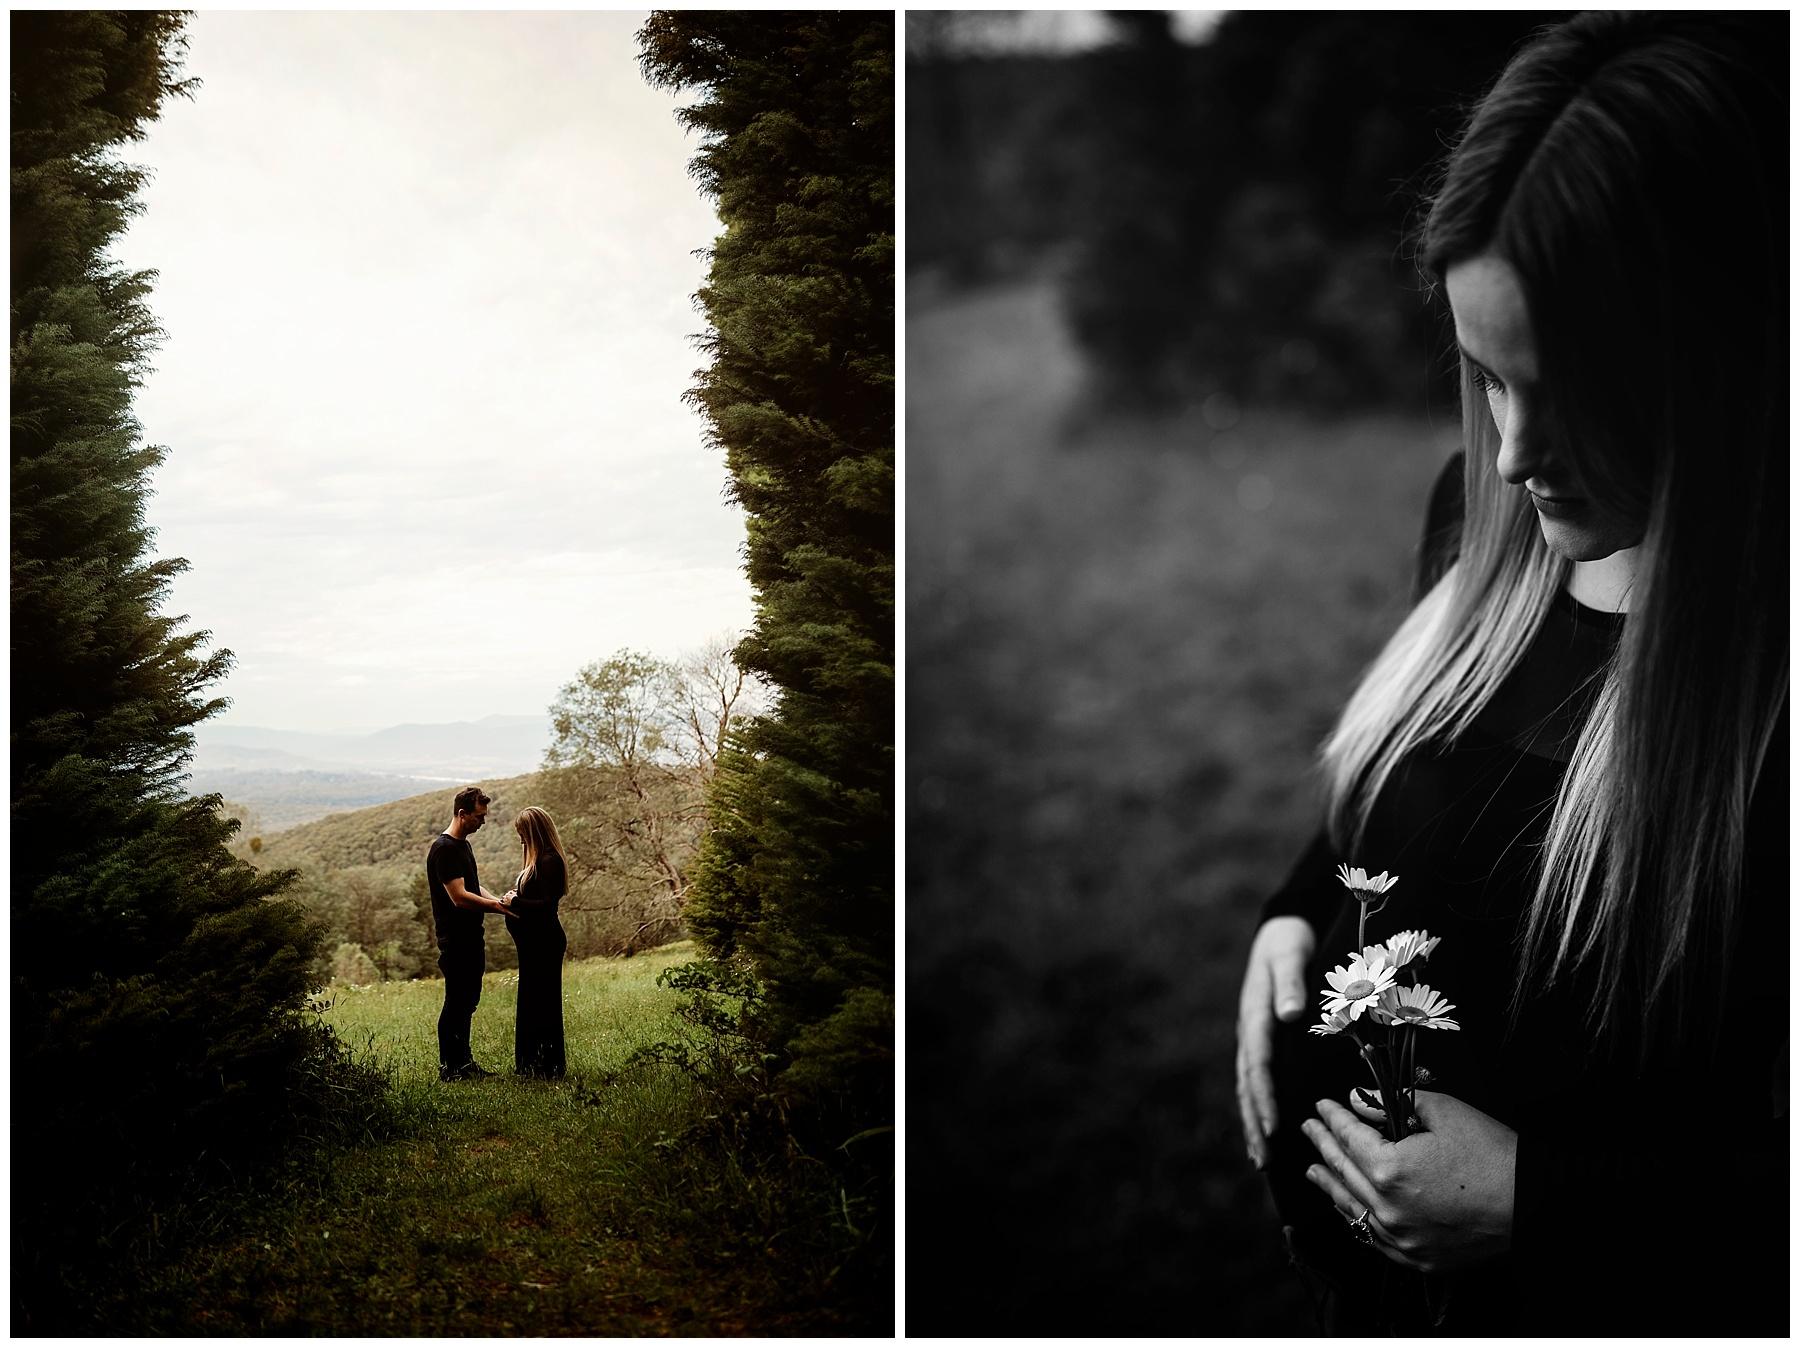 South gippsland maternity photography - korumburra